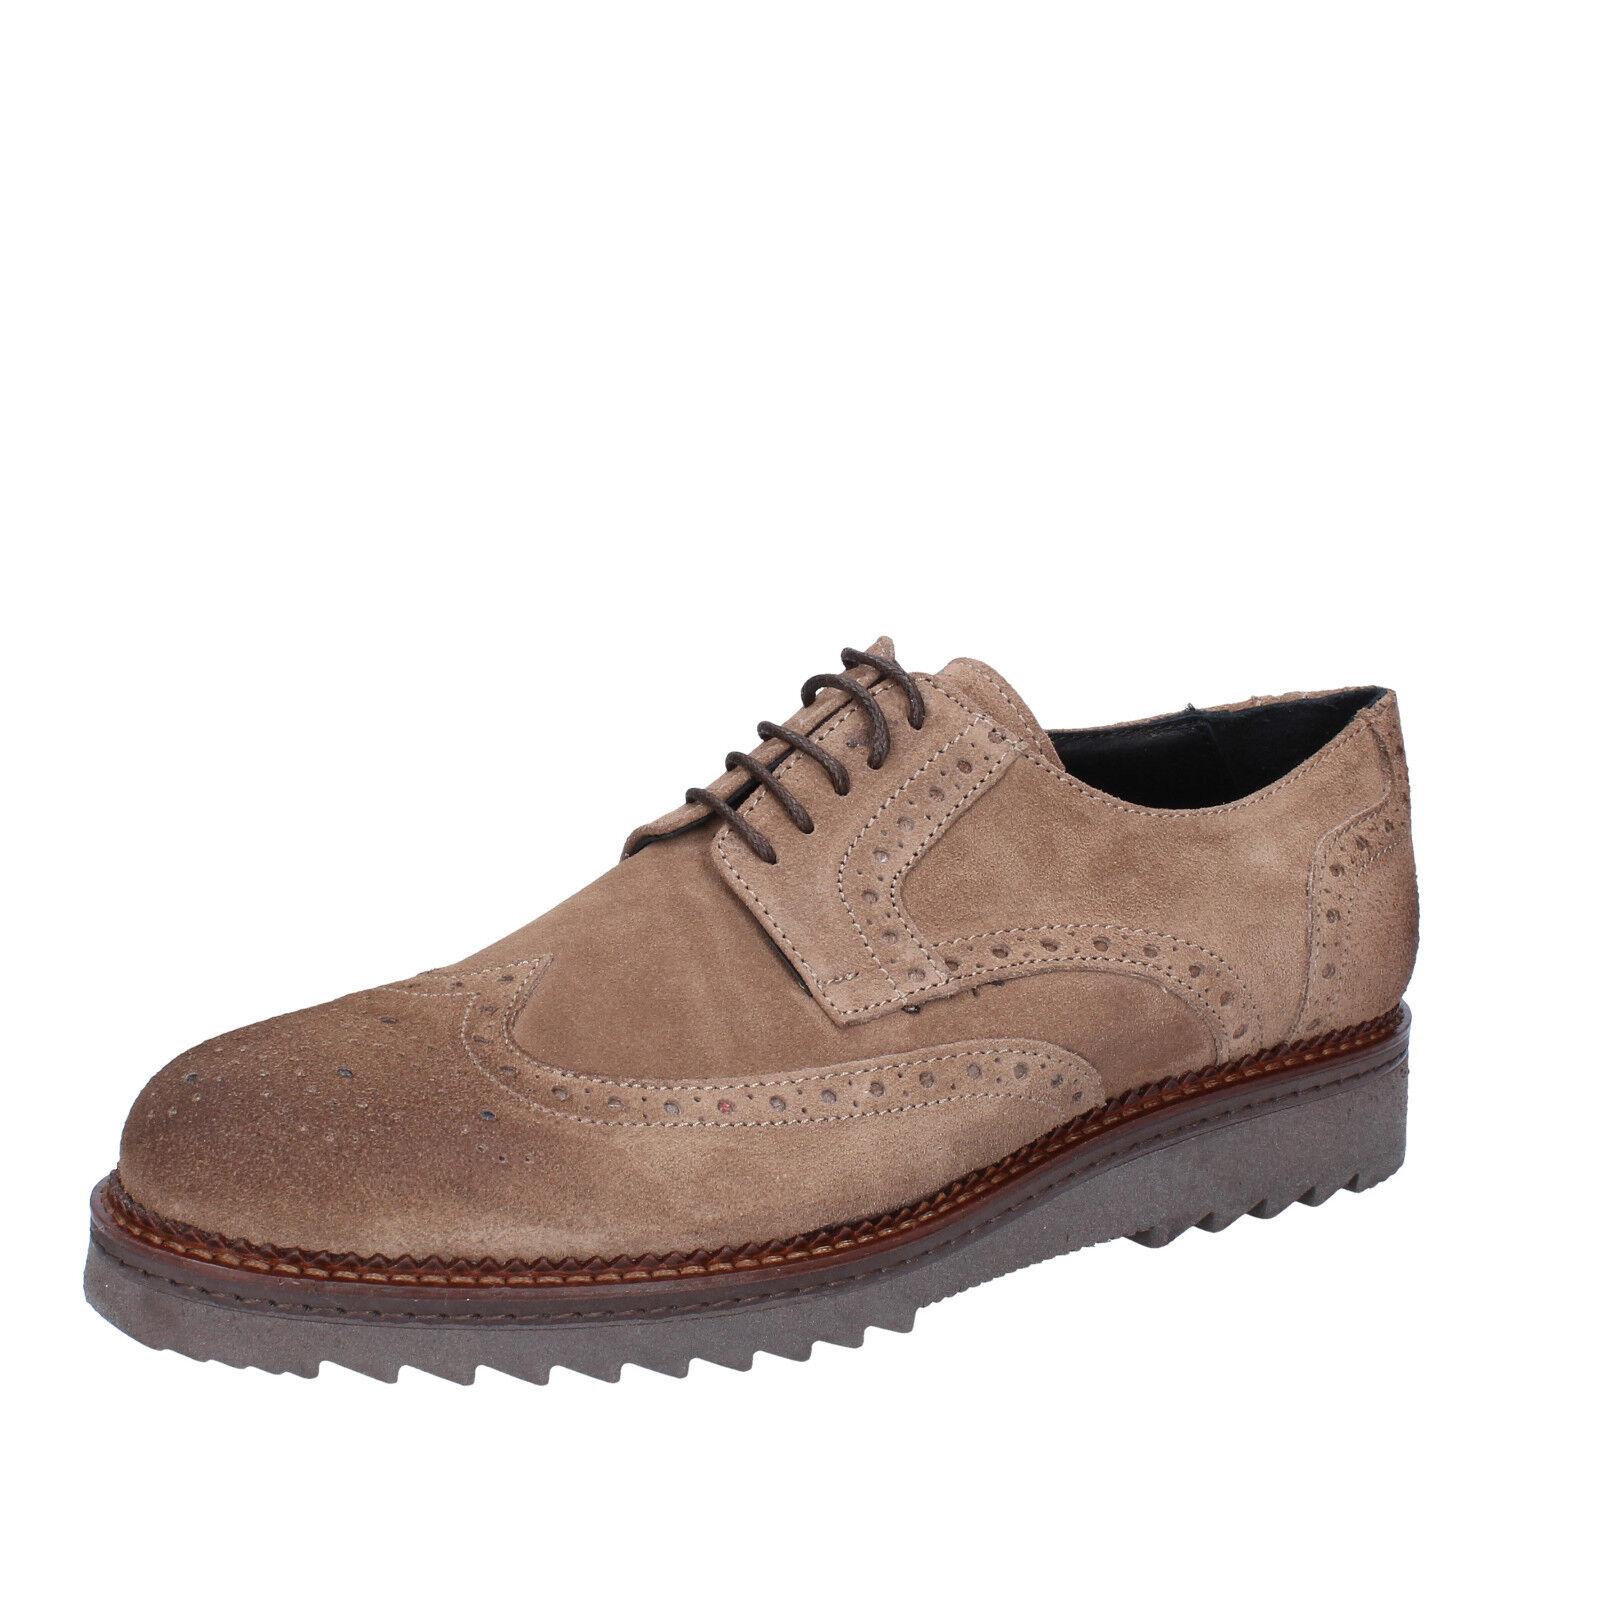 Men's shoes SALVO BARONE 8 (EU 41) elegant beige suede BZ191-C